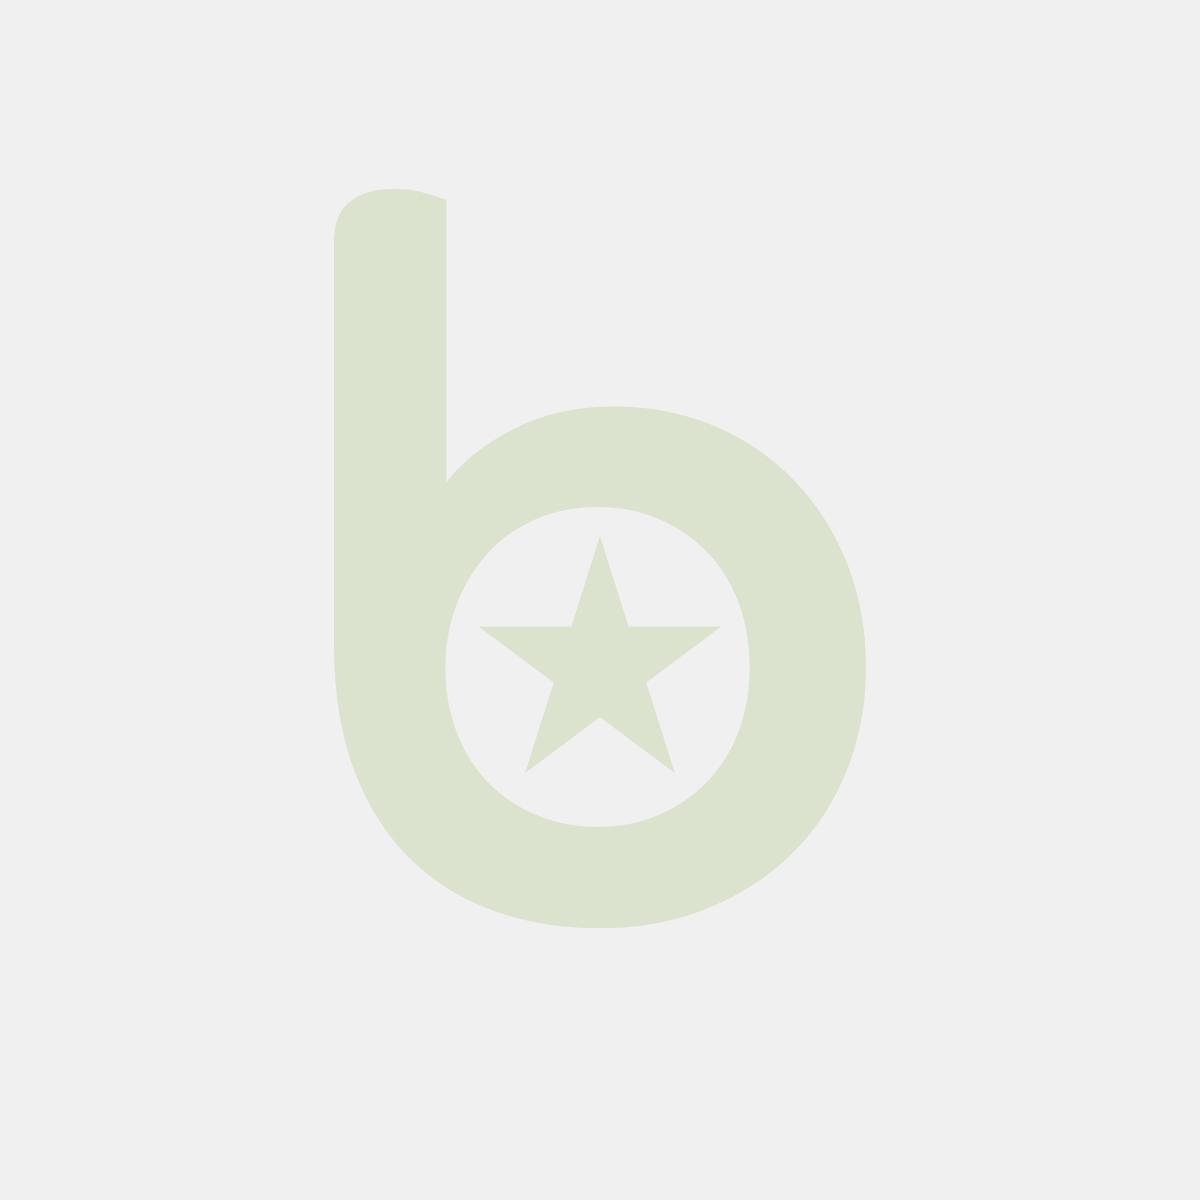 FINGERFOOD - pucharek PS 50ml czarny 4,5x4,5x5 op. 50 sztuk